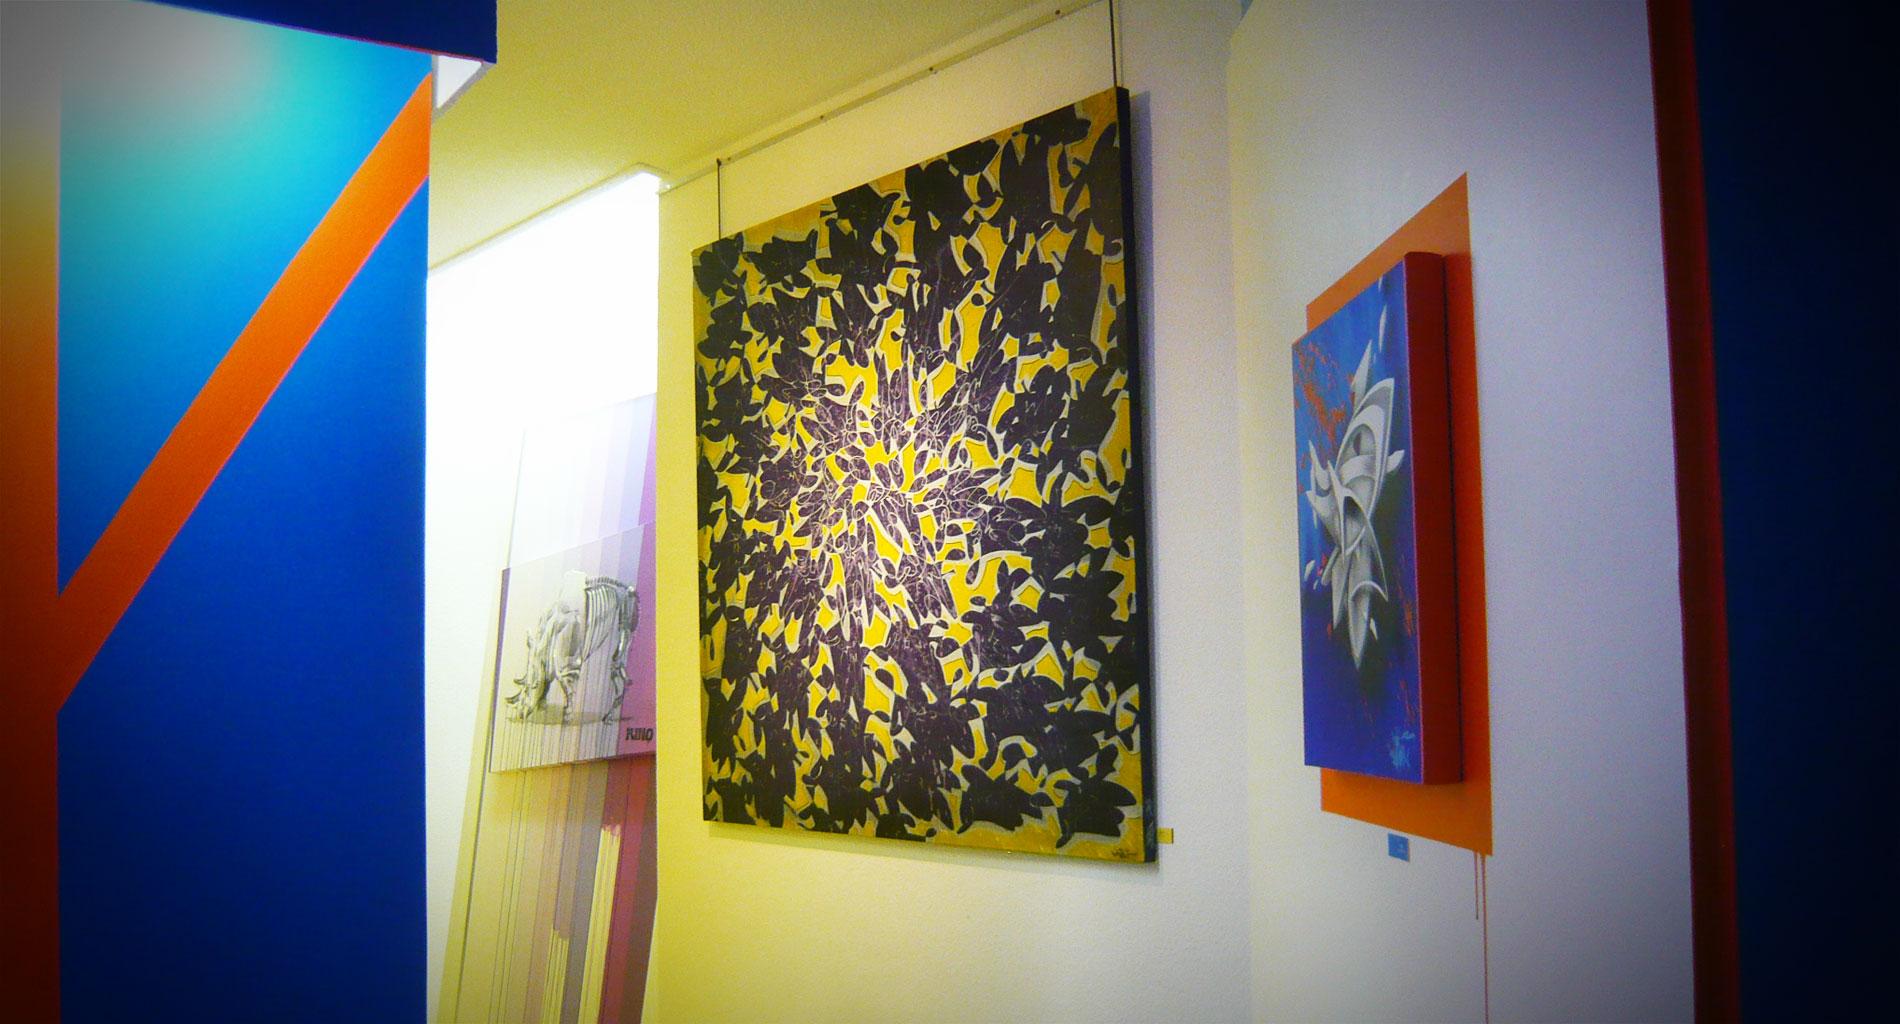 2013_exposition_couleurs_issoire_rino_deft_kaer